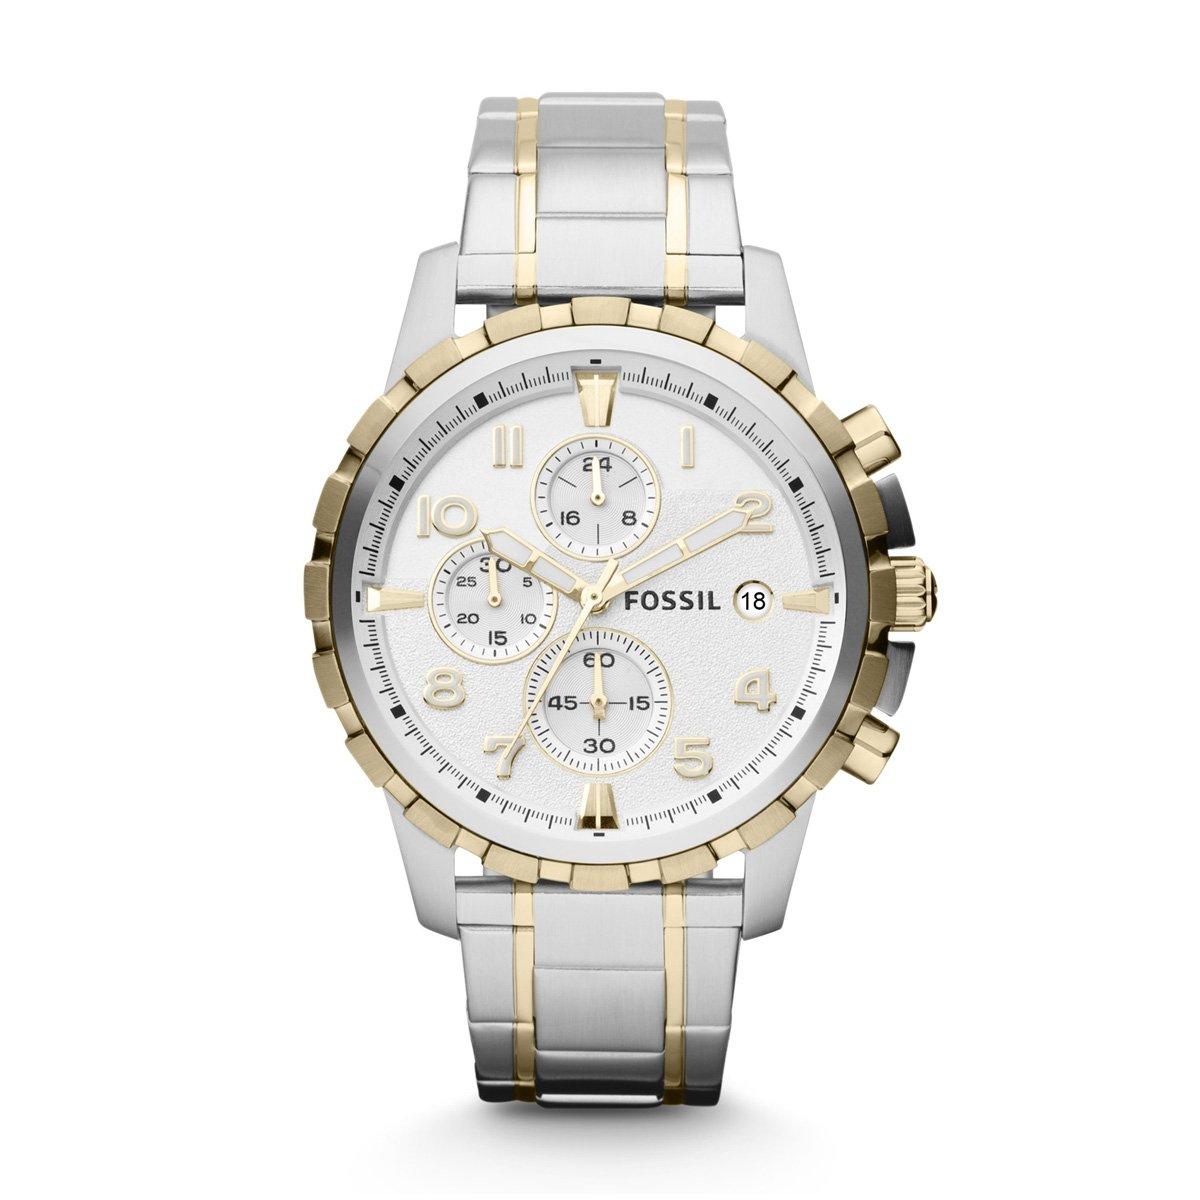 409dd81688aa Reloj fossil hombre sears – Joyas de plata